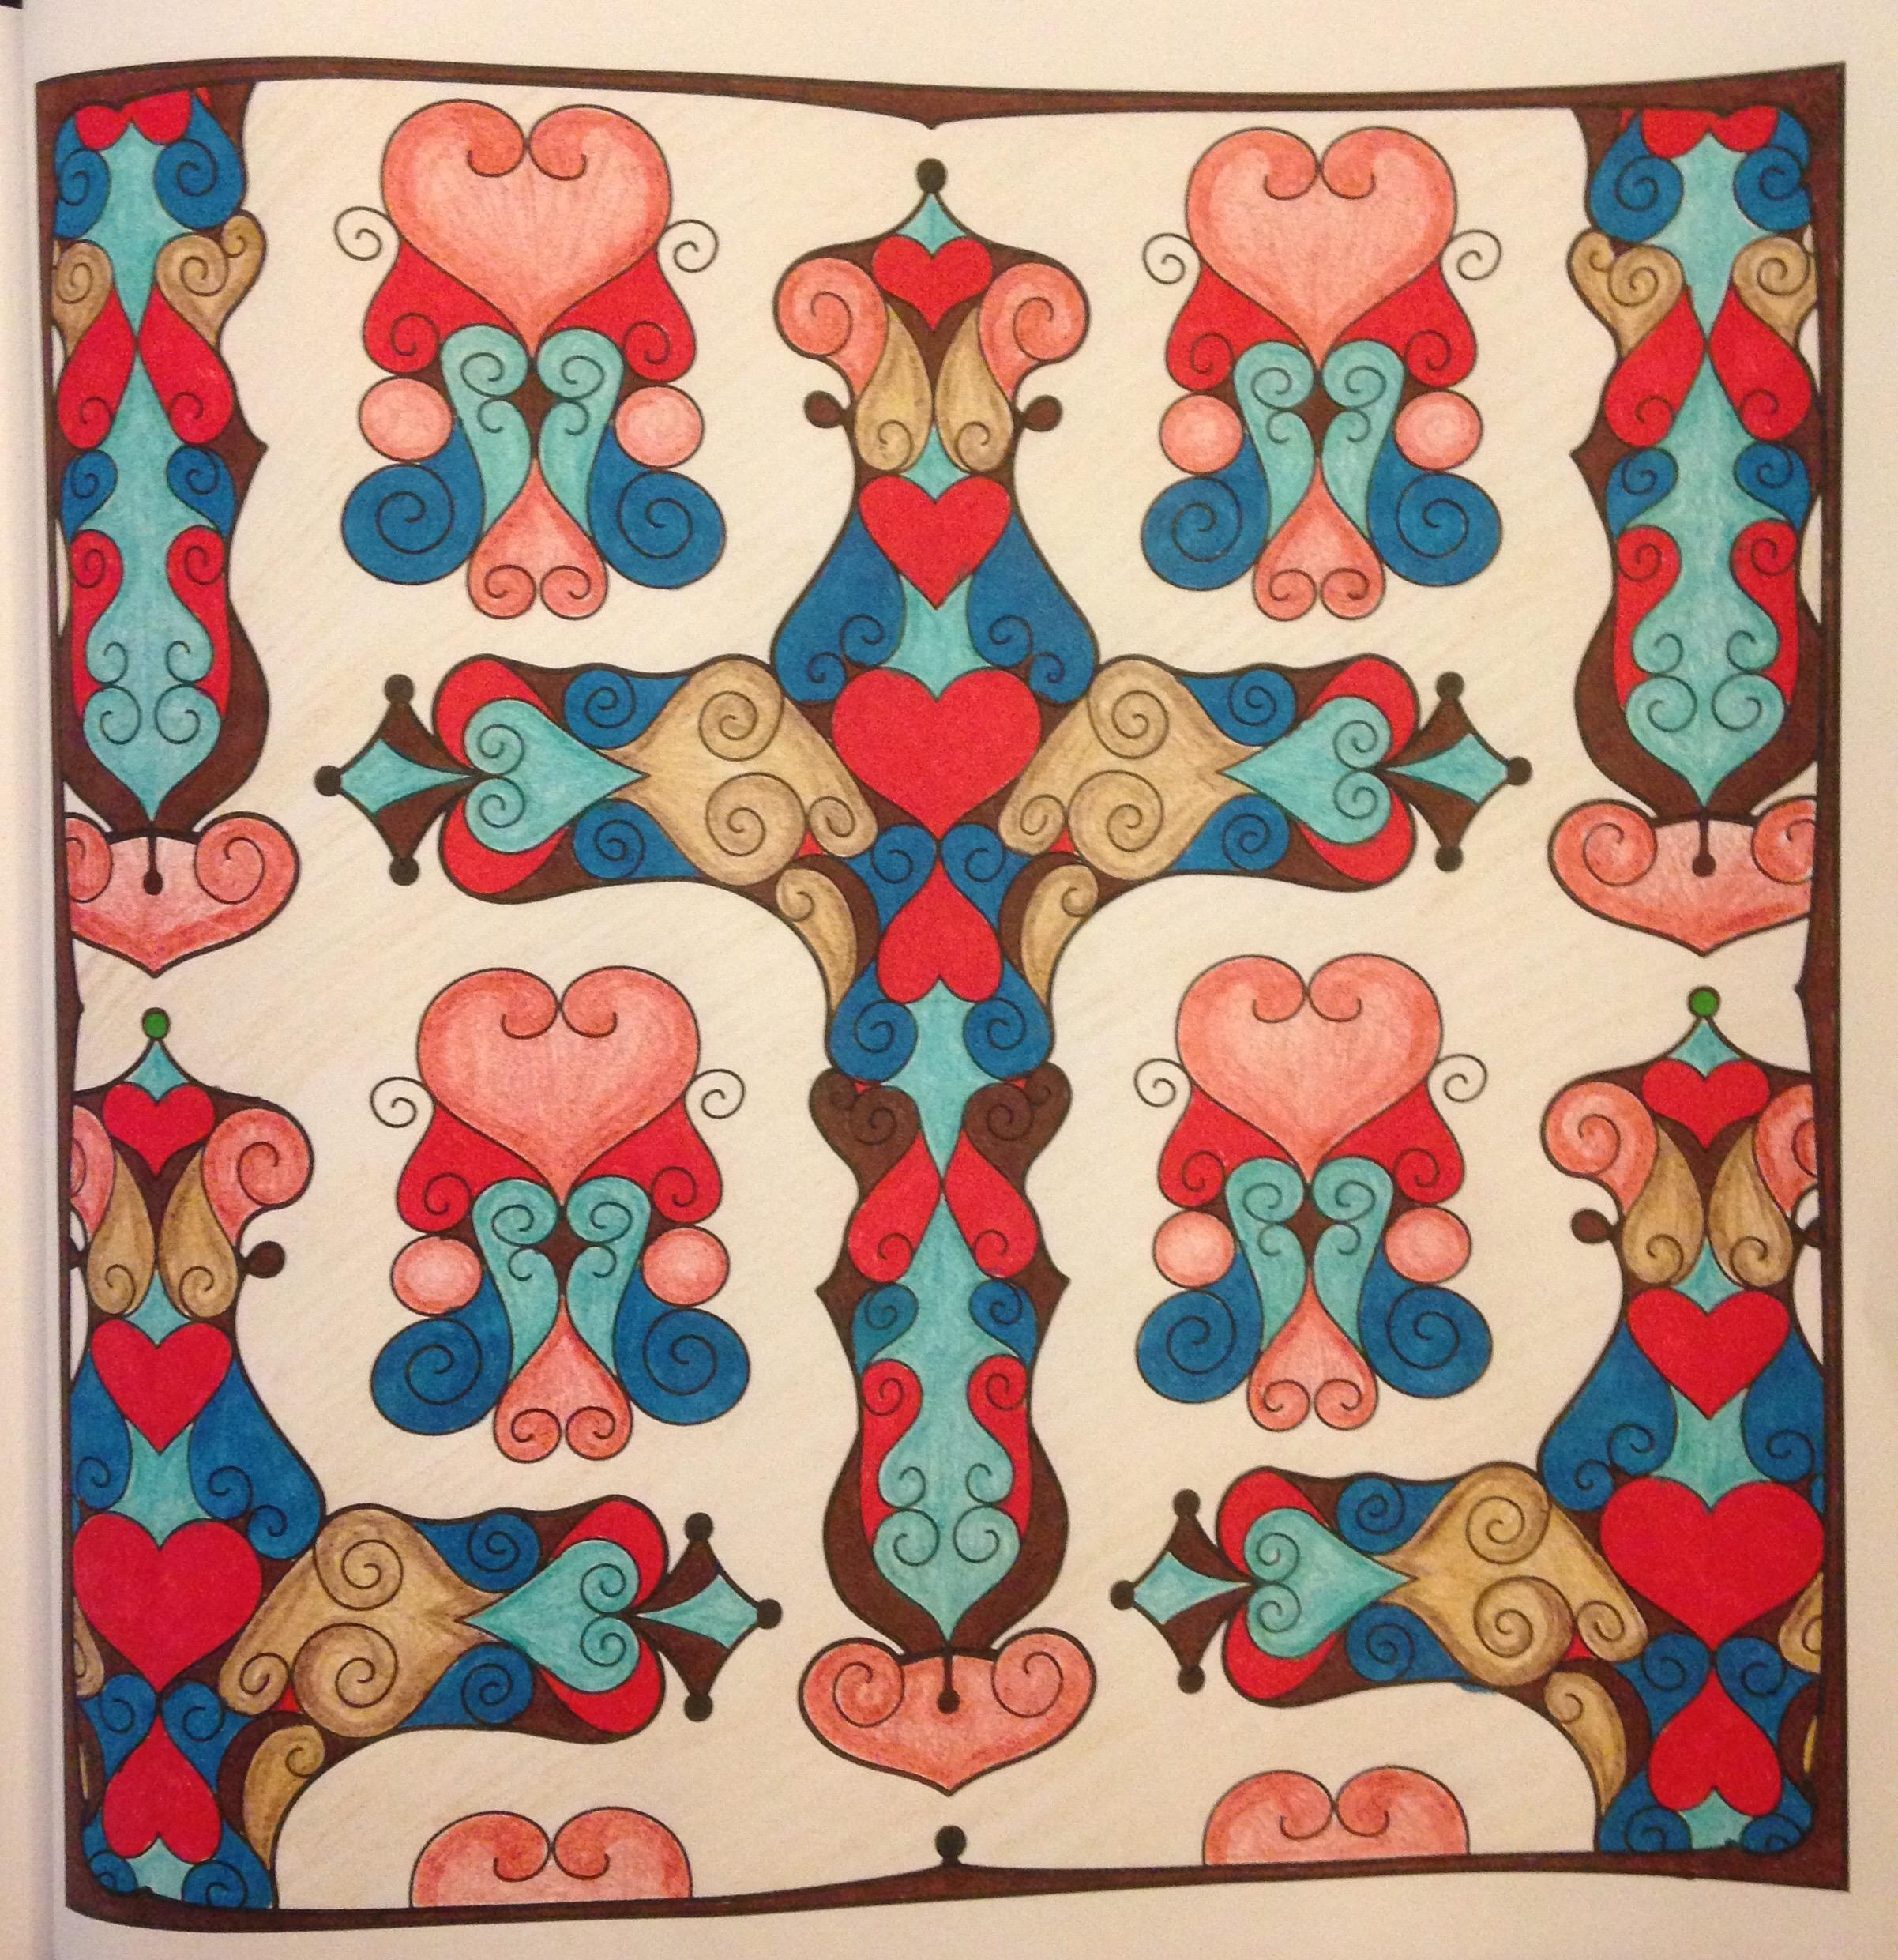 Colorist: Lora Pancoast Media: Pencils and marker Design: Ornate Cross Book: OrnaMENTALs Splendid Symmetry